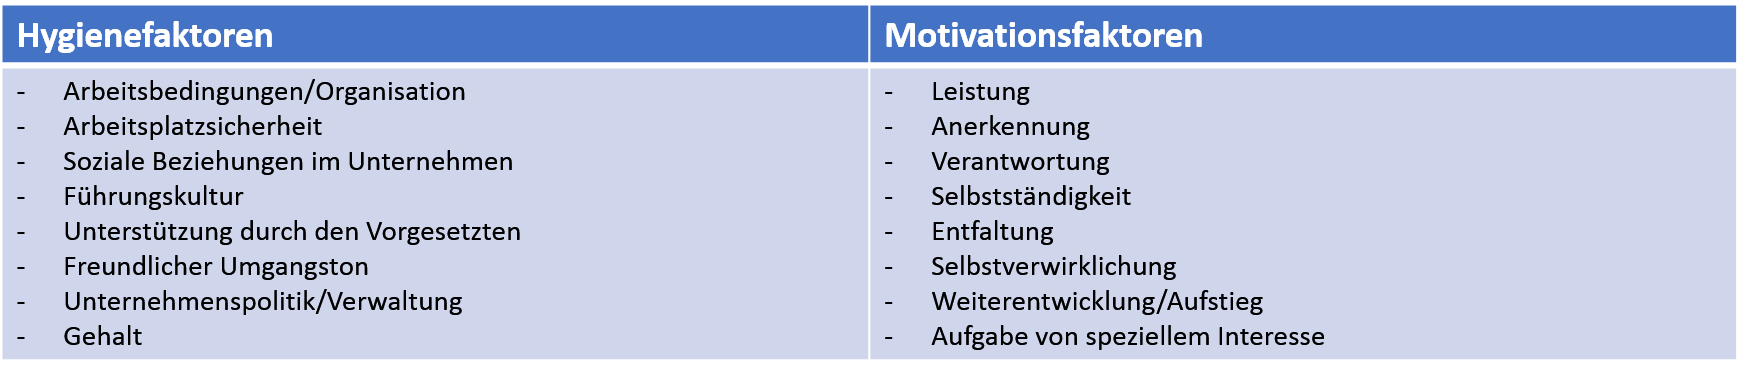 Motivationsfaktoren